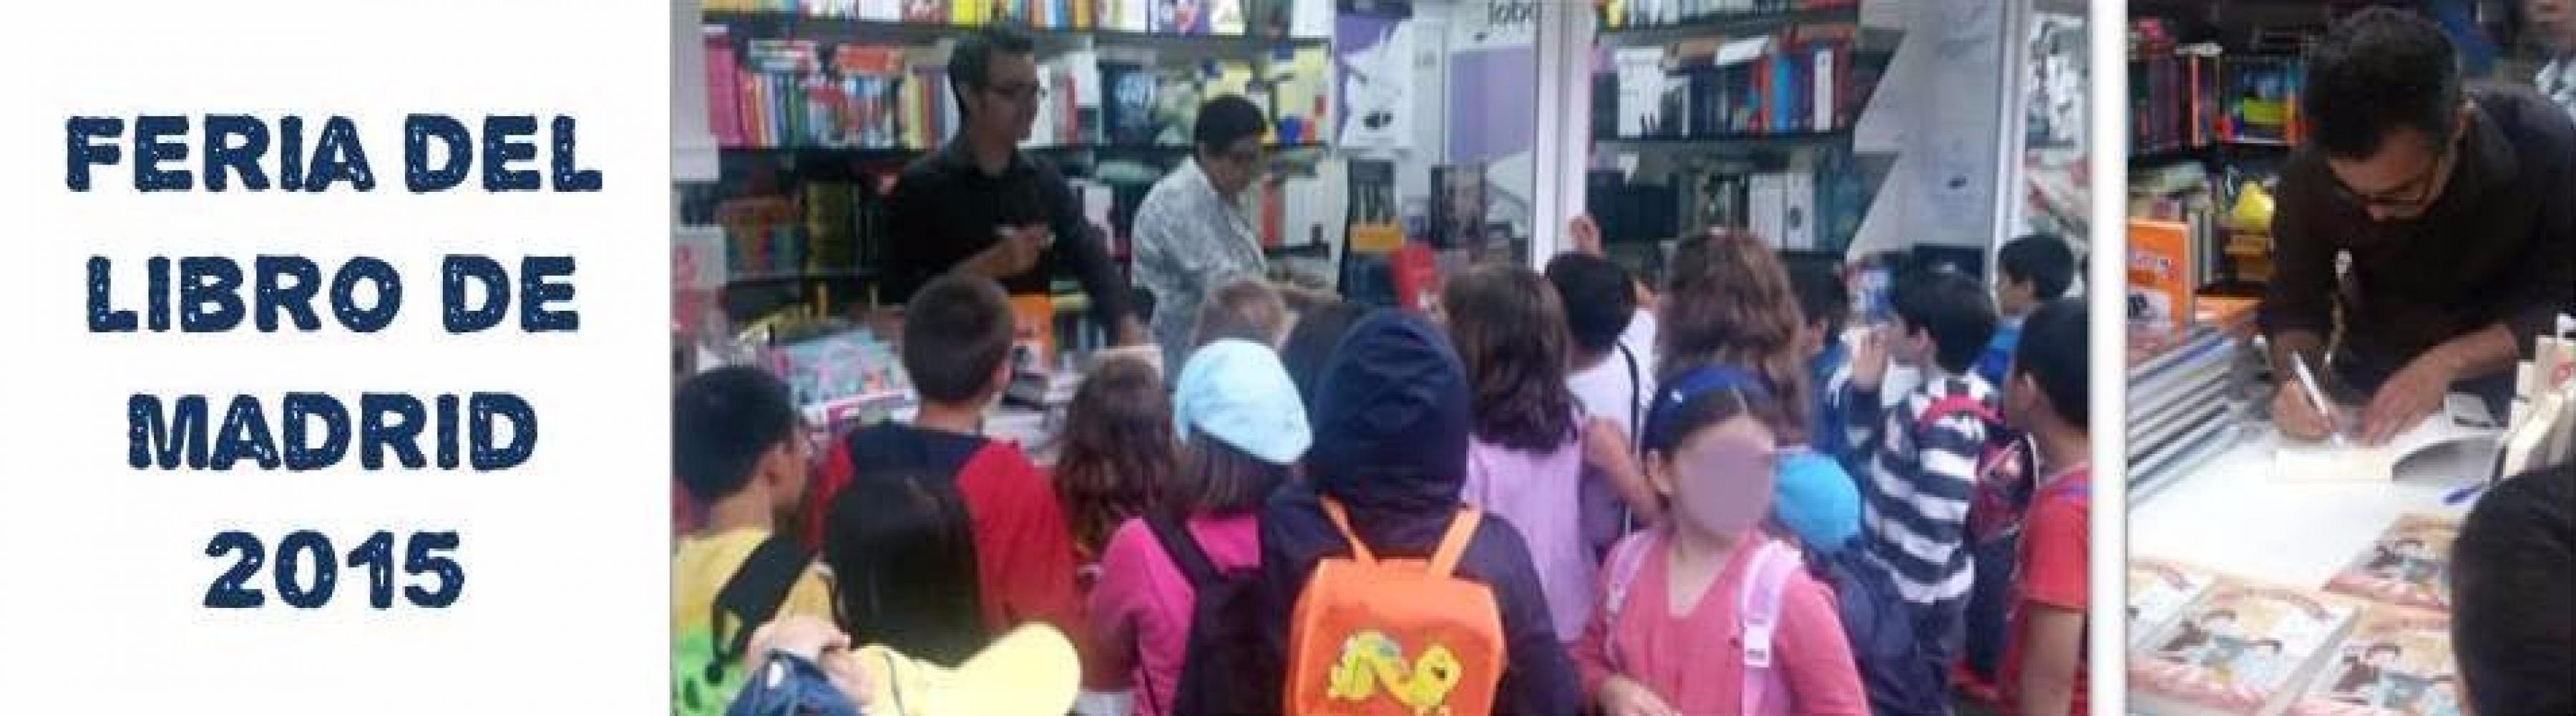 Cabecera Feria del libro